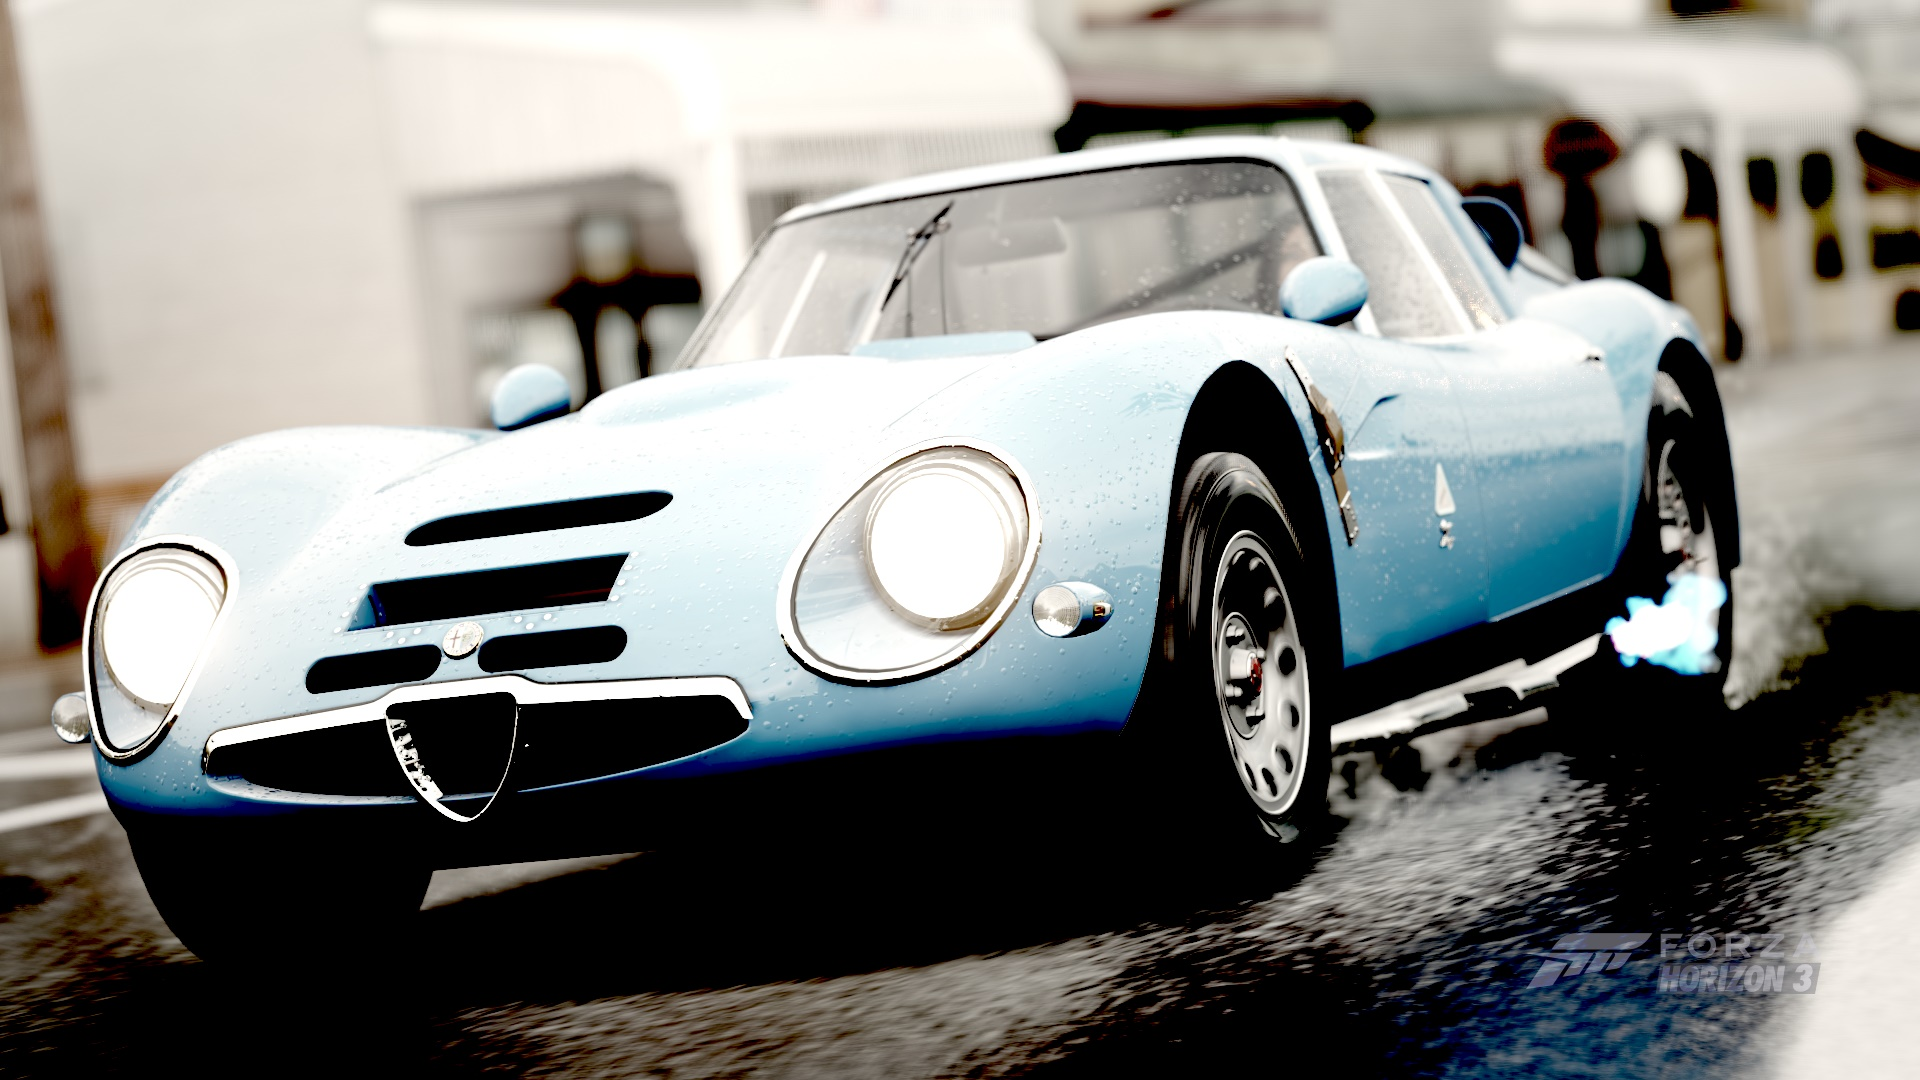 Forza Horizon 3 Cars Alfa Romeo Magnesium Wheels 1965 Giulia Tz2 Photo By Windsweptdragon